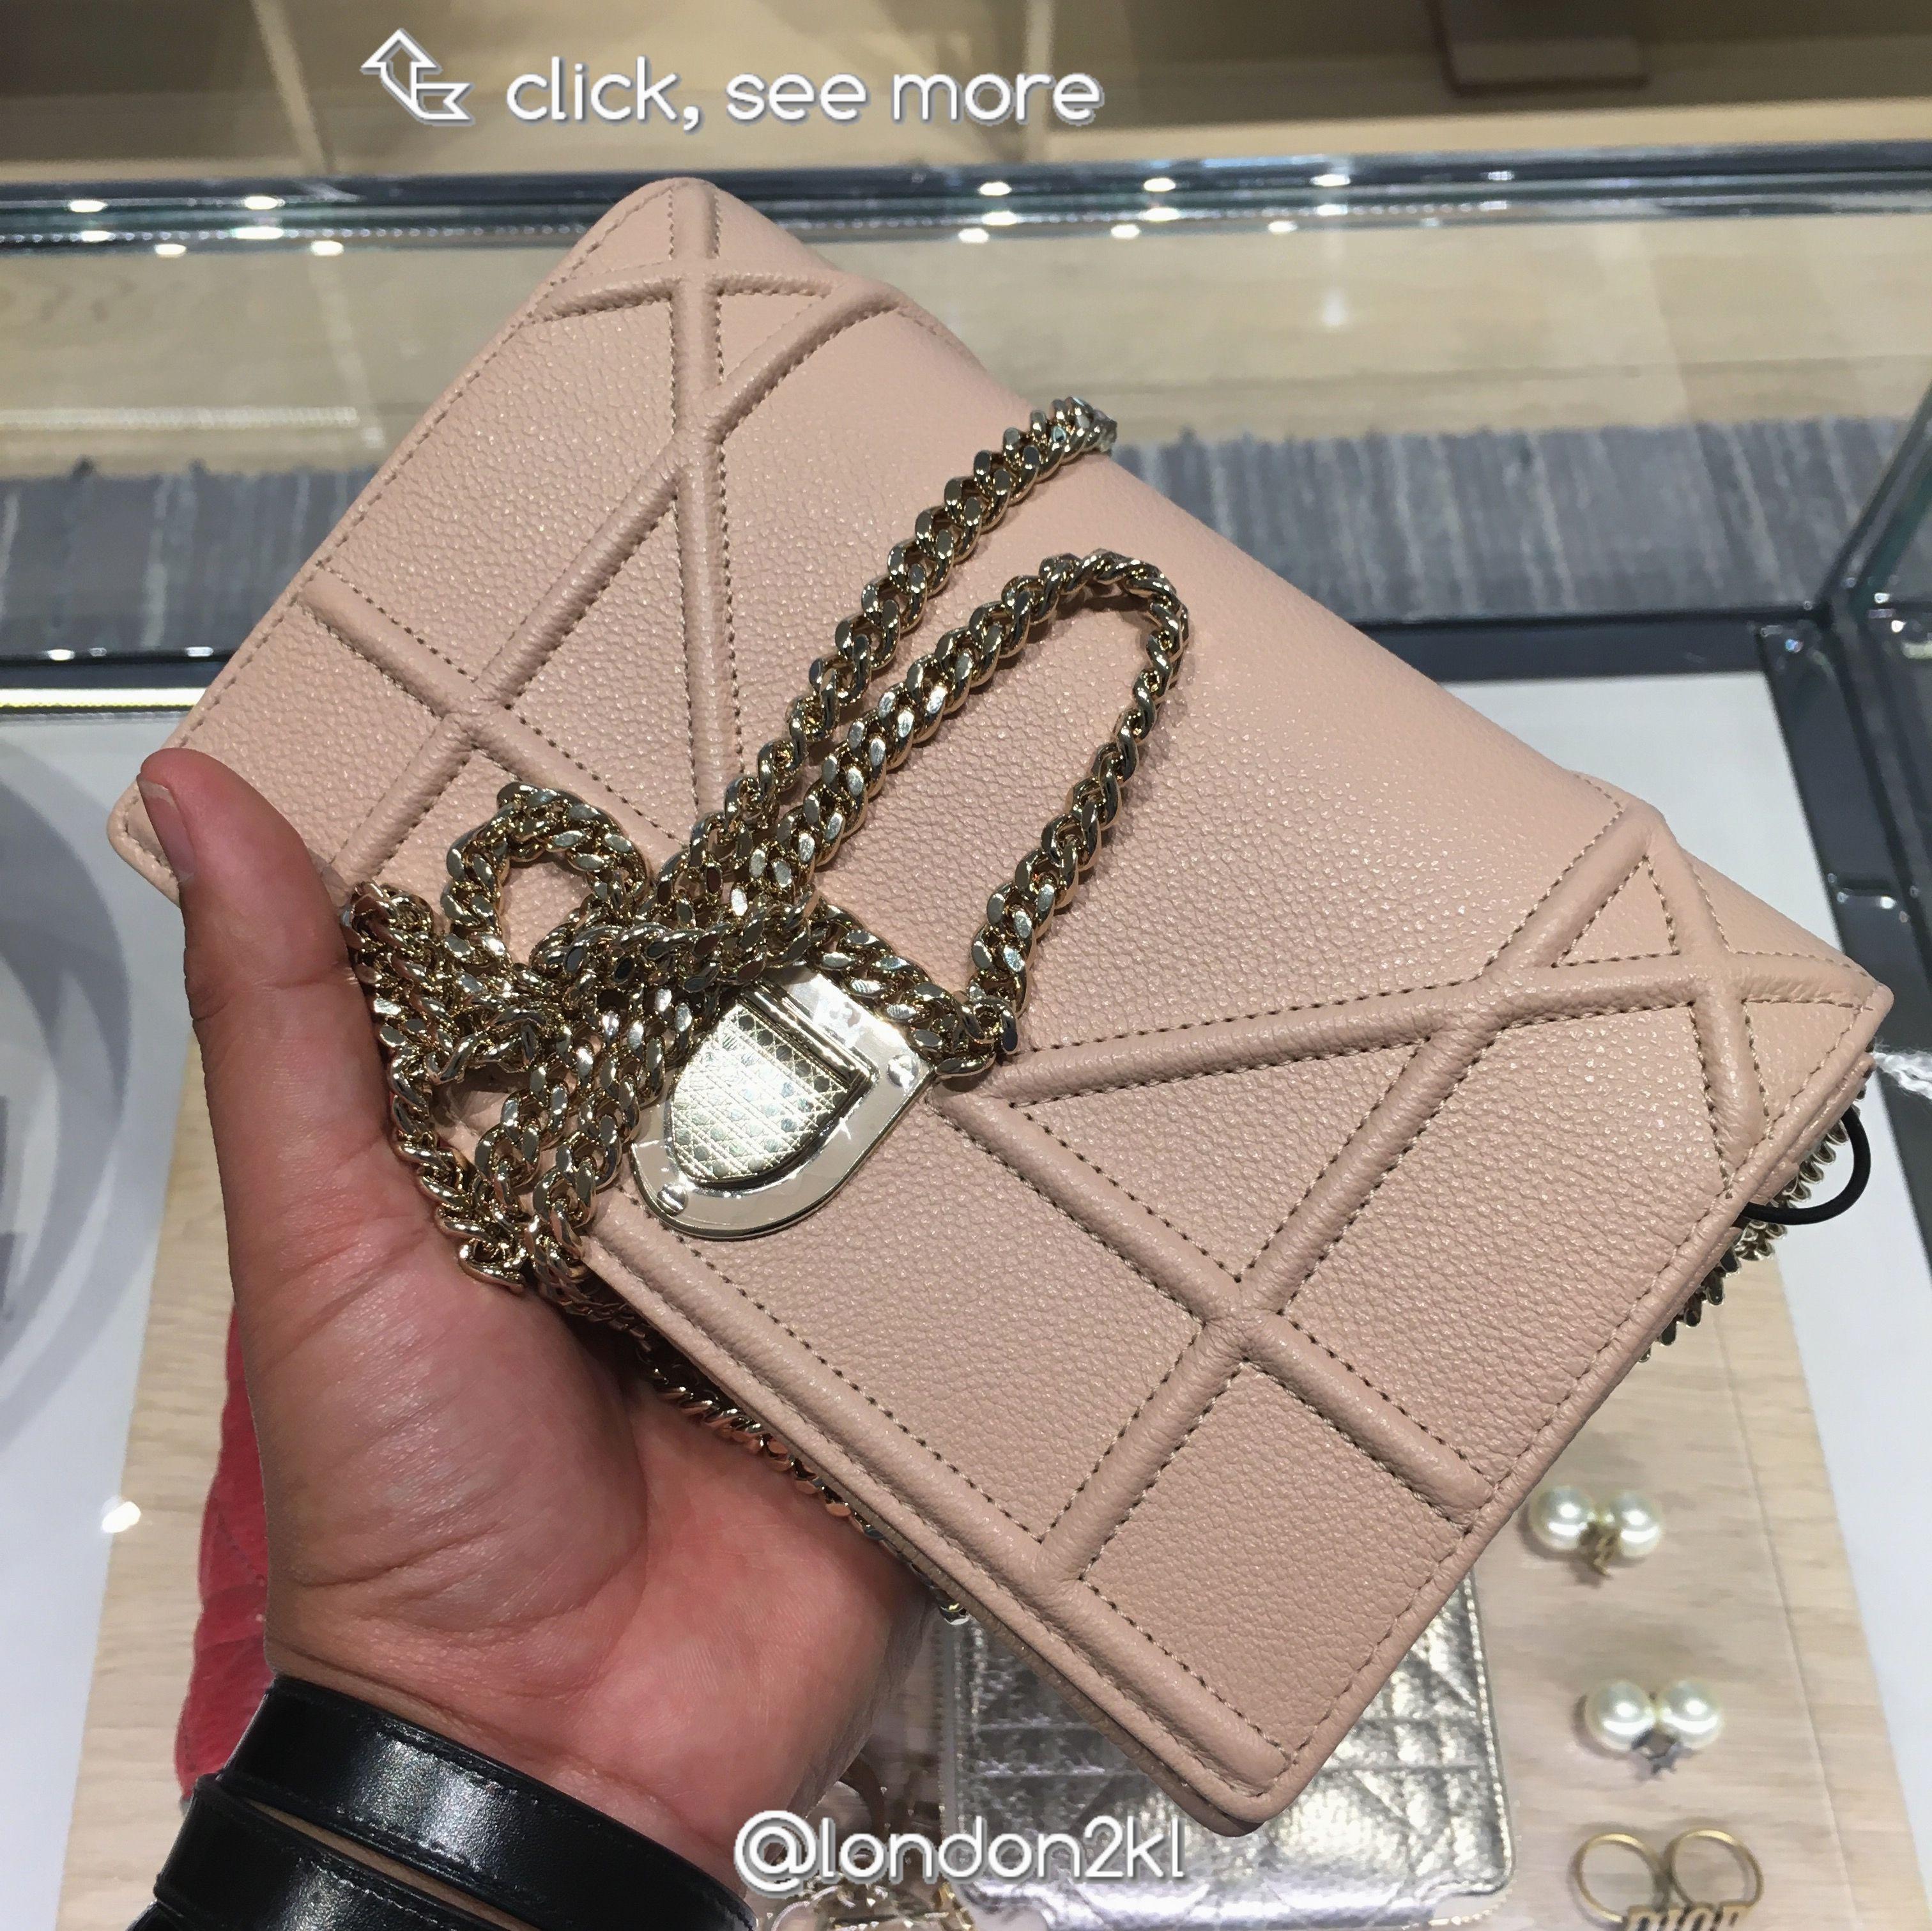 c20c4a4eb04 Dior WOC Diorama RM5,775 | Bags & shoes | Dior diorama bag, Diorama ...